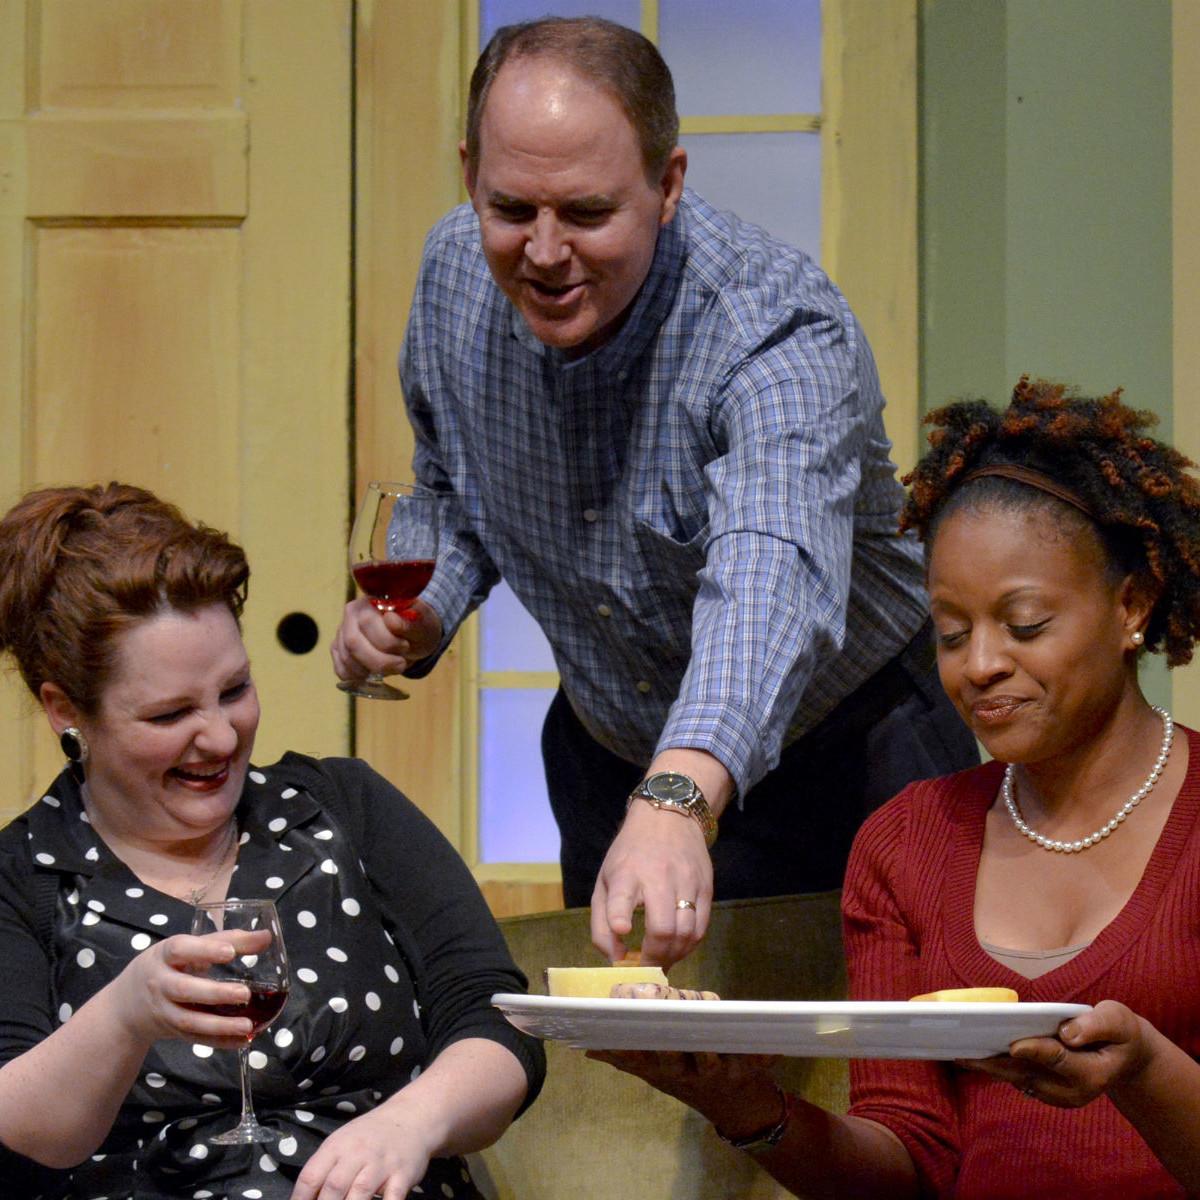 WaterTower Theatre presents Good People